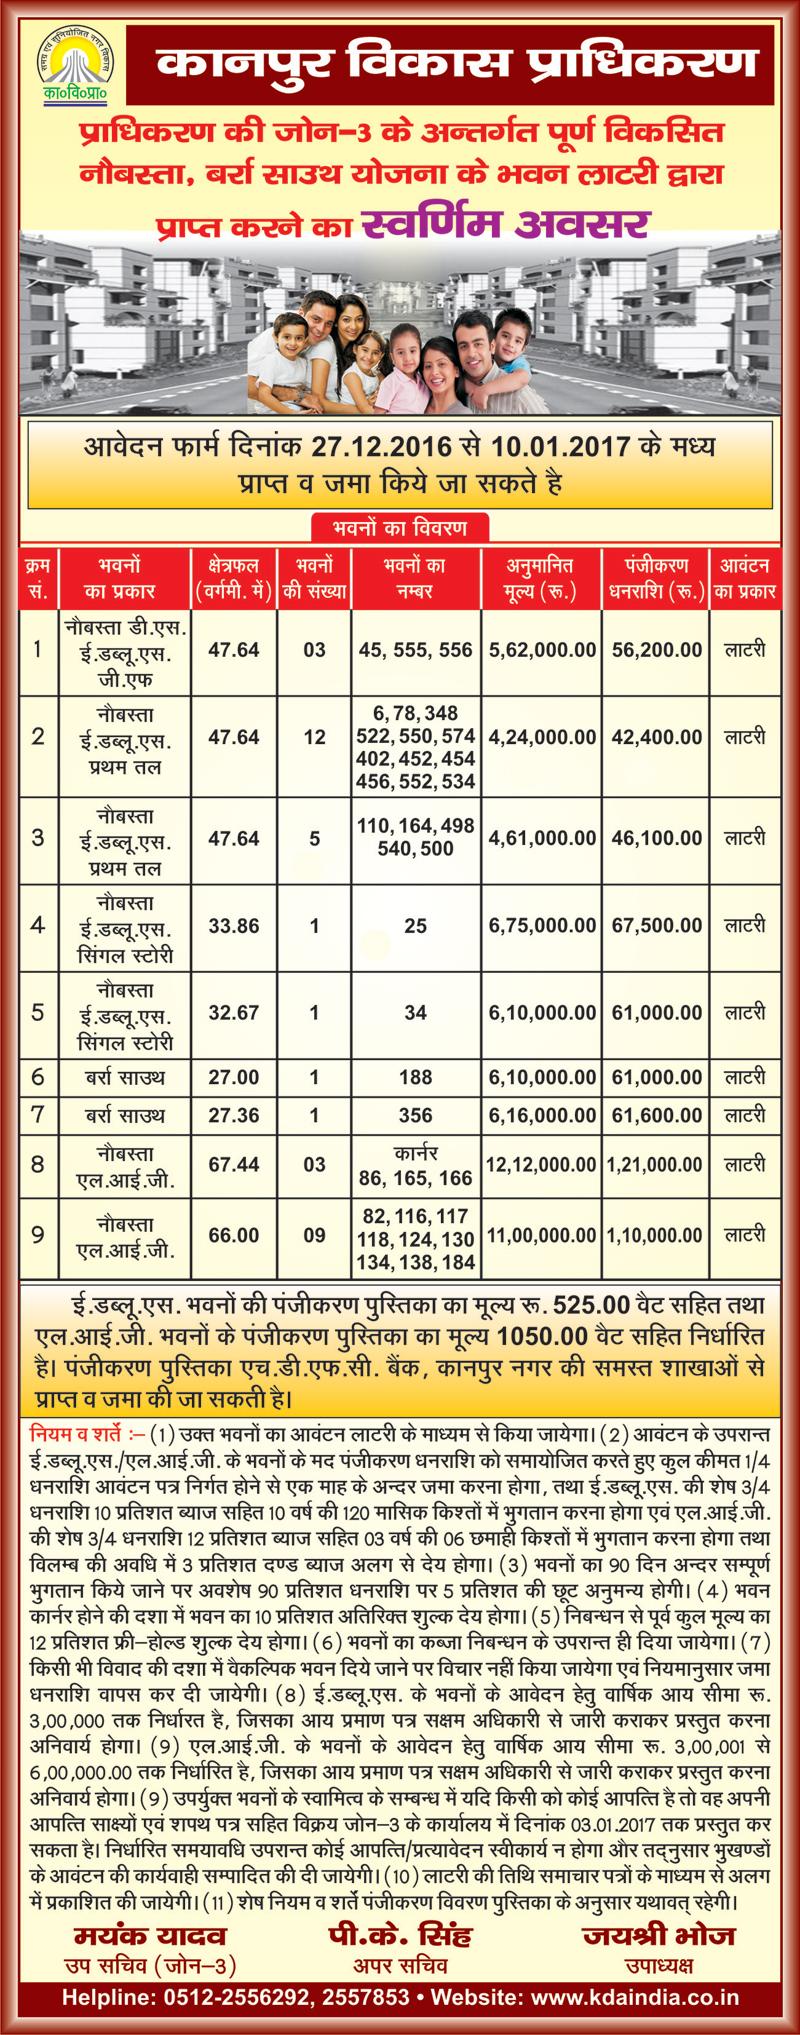 Kda Kanpur Naubasta Barra South Scheme For Ews Lig Flats